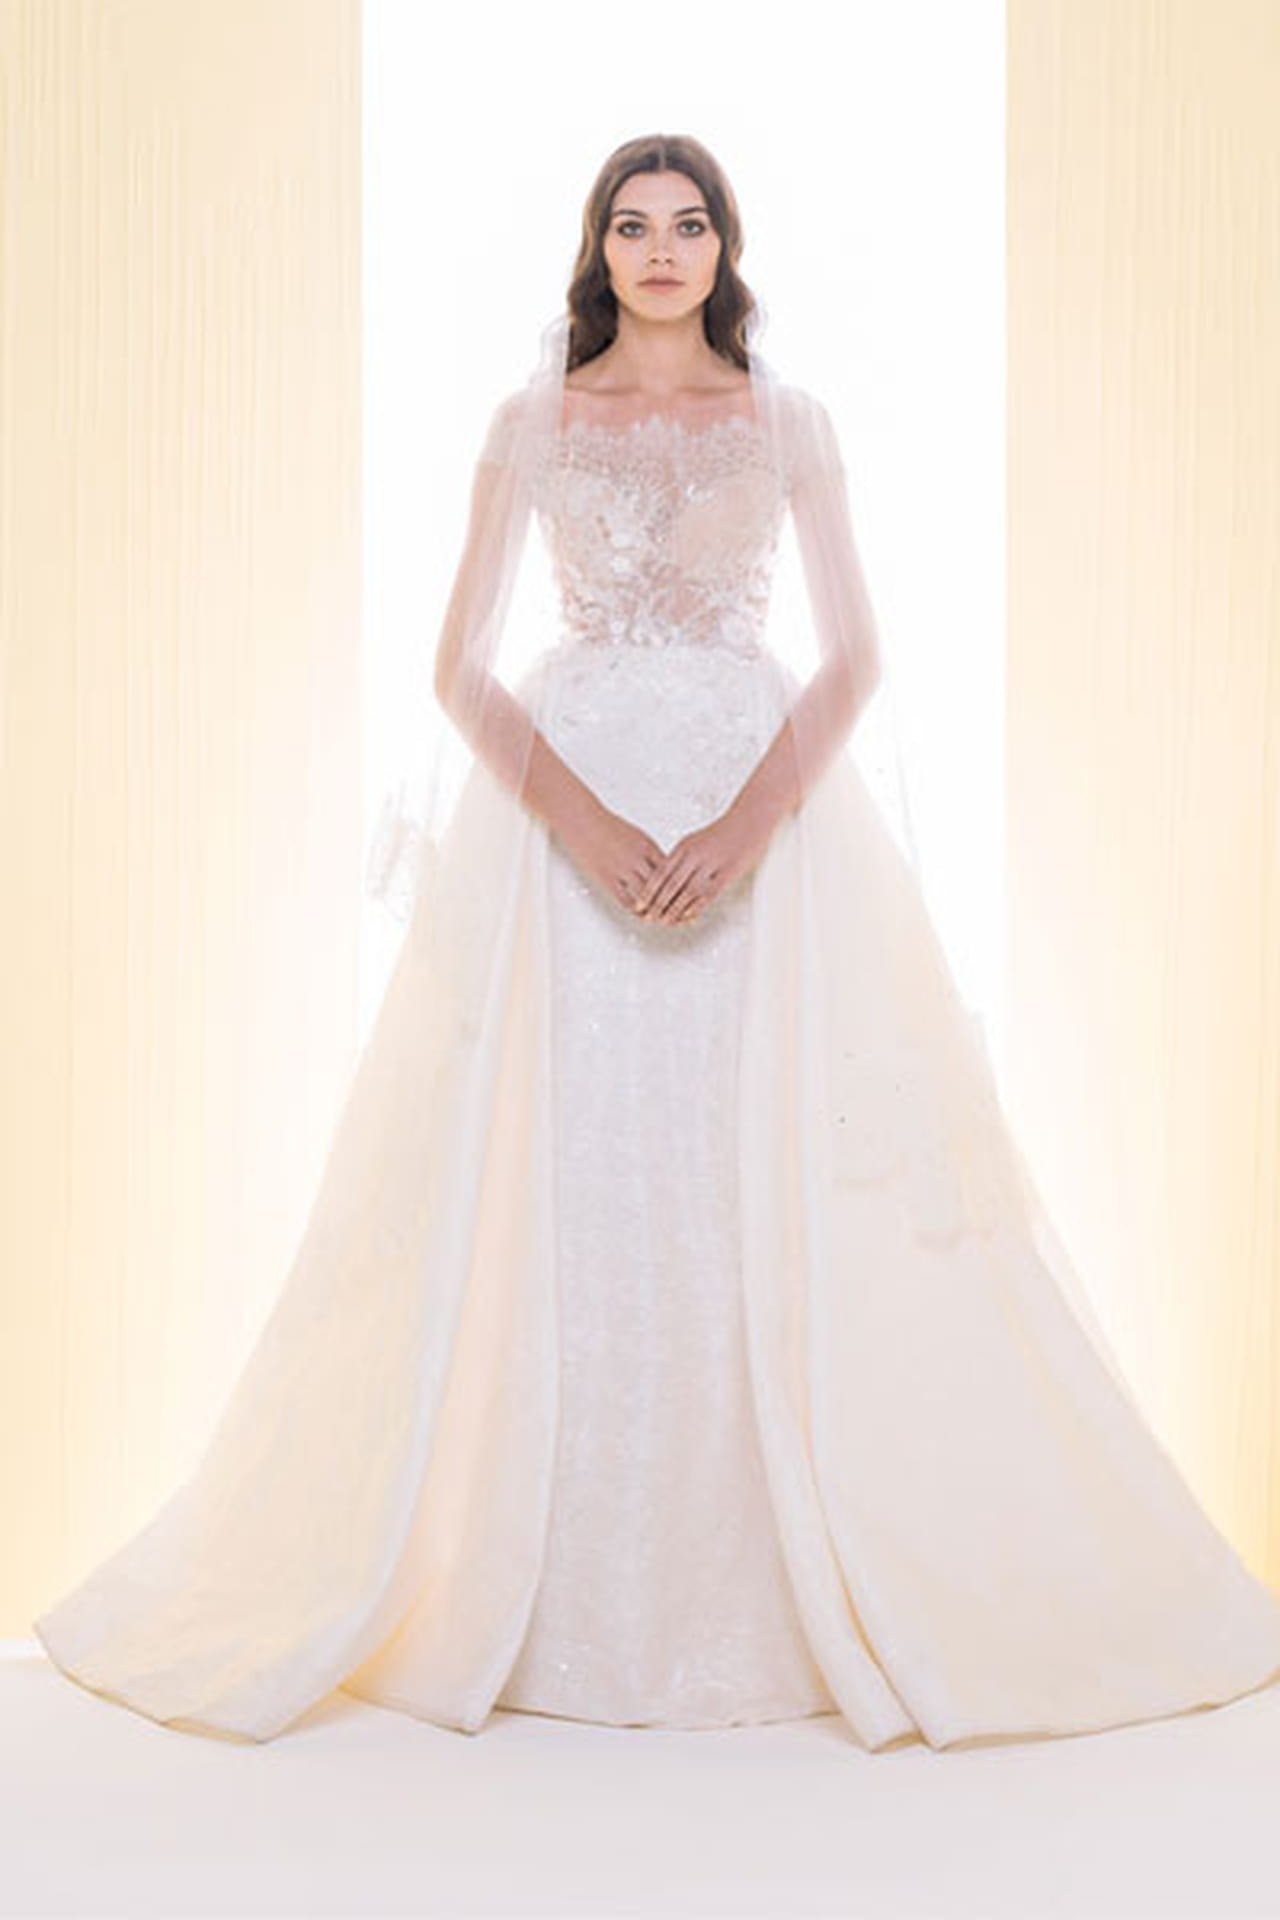 62b2a7276 فساتين زفاف سعيد قبيسي 2016 - صورة رقم 1